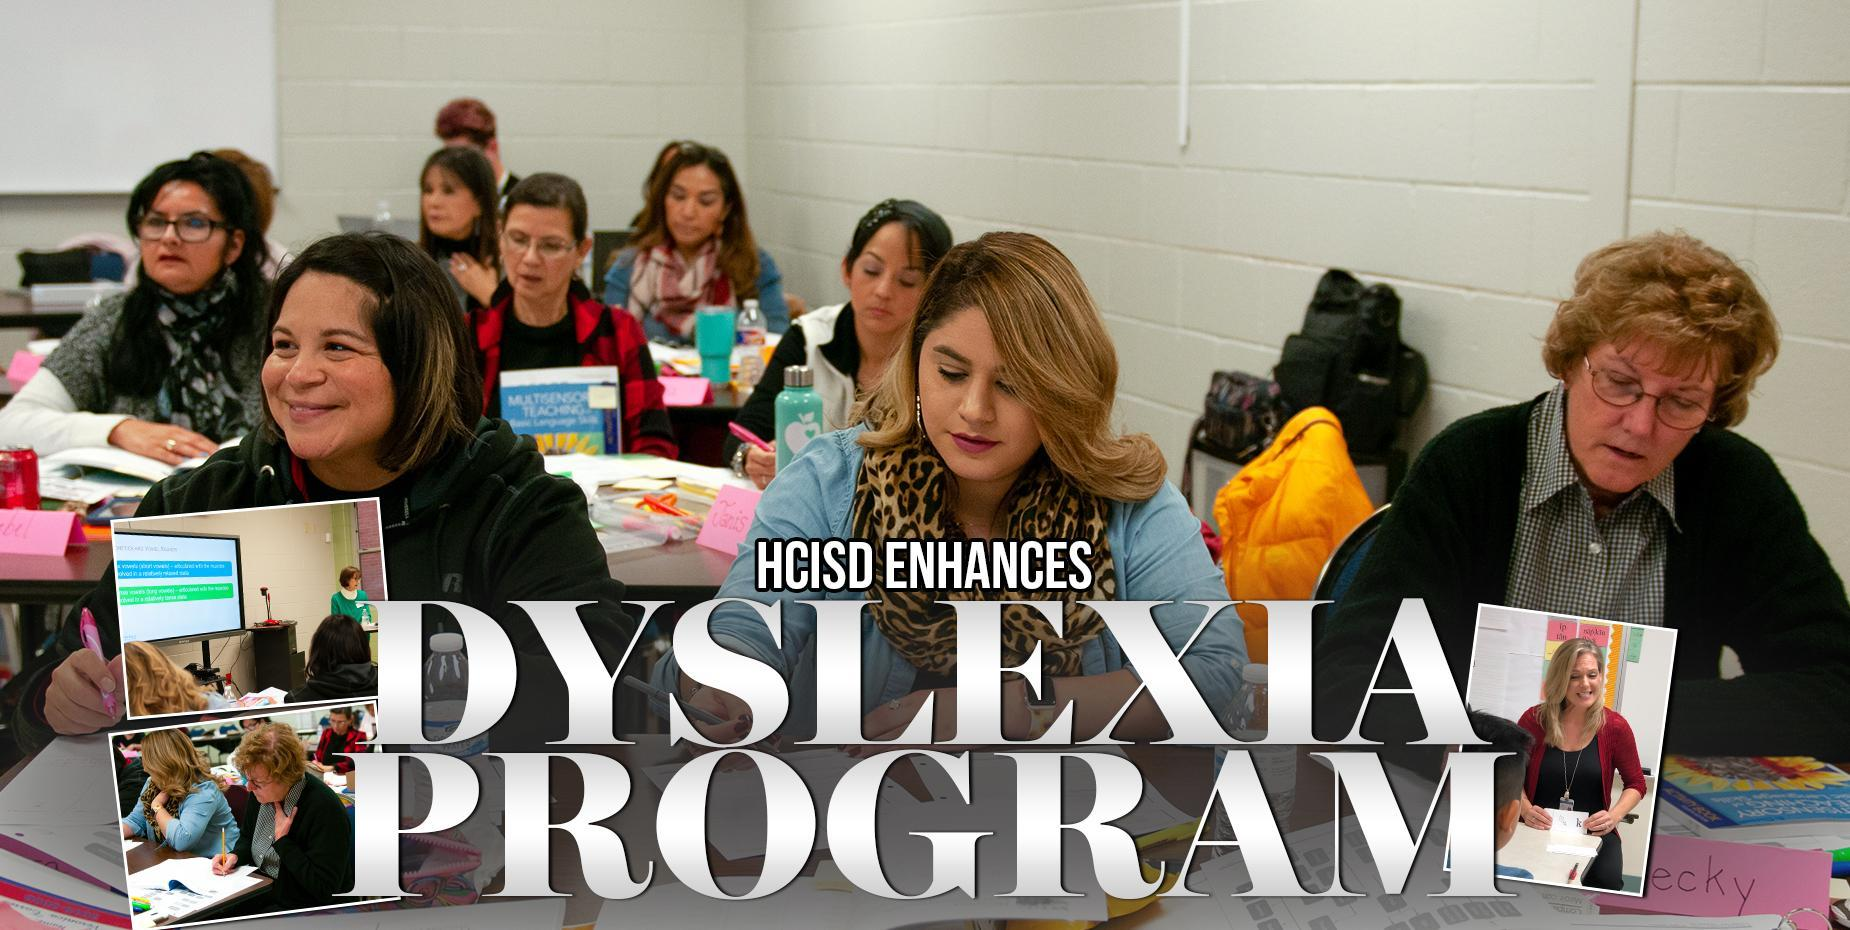 HCISD Enhances Dyslexia Program